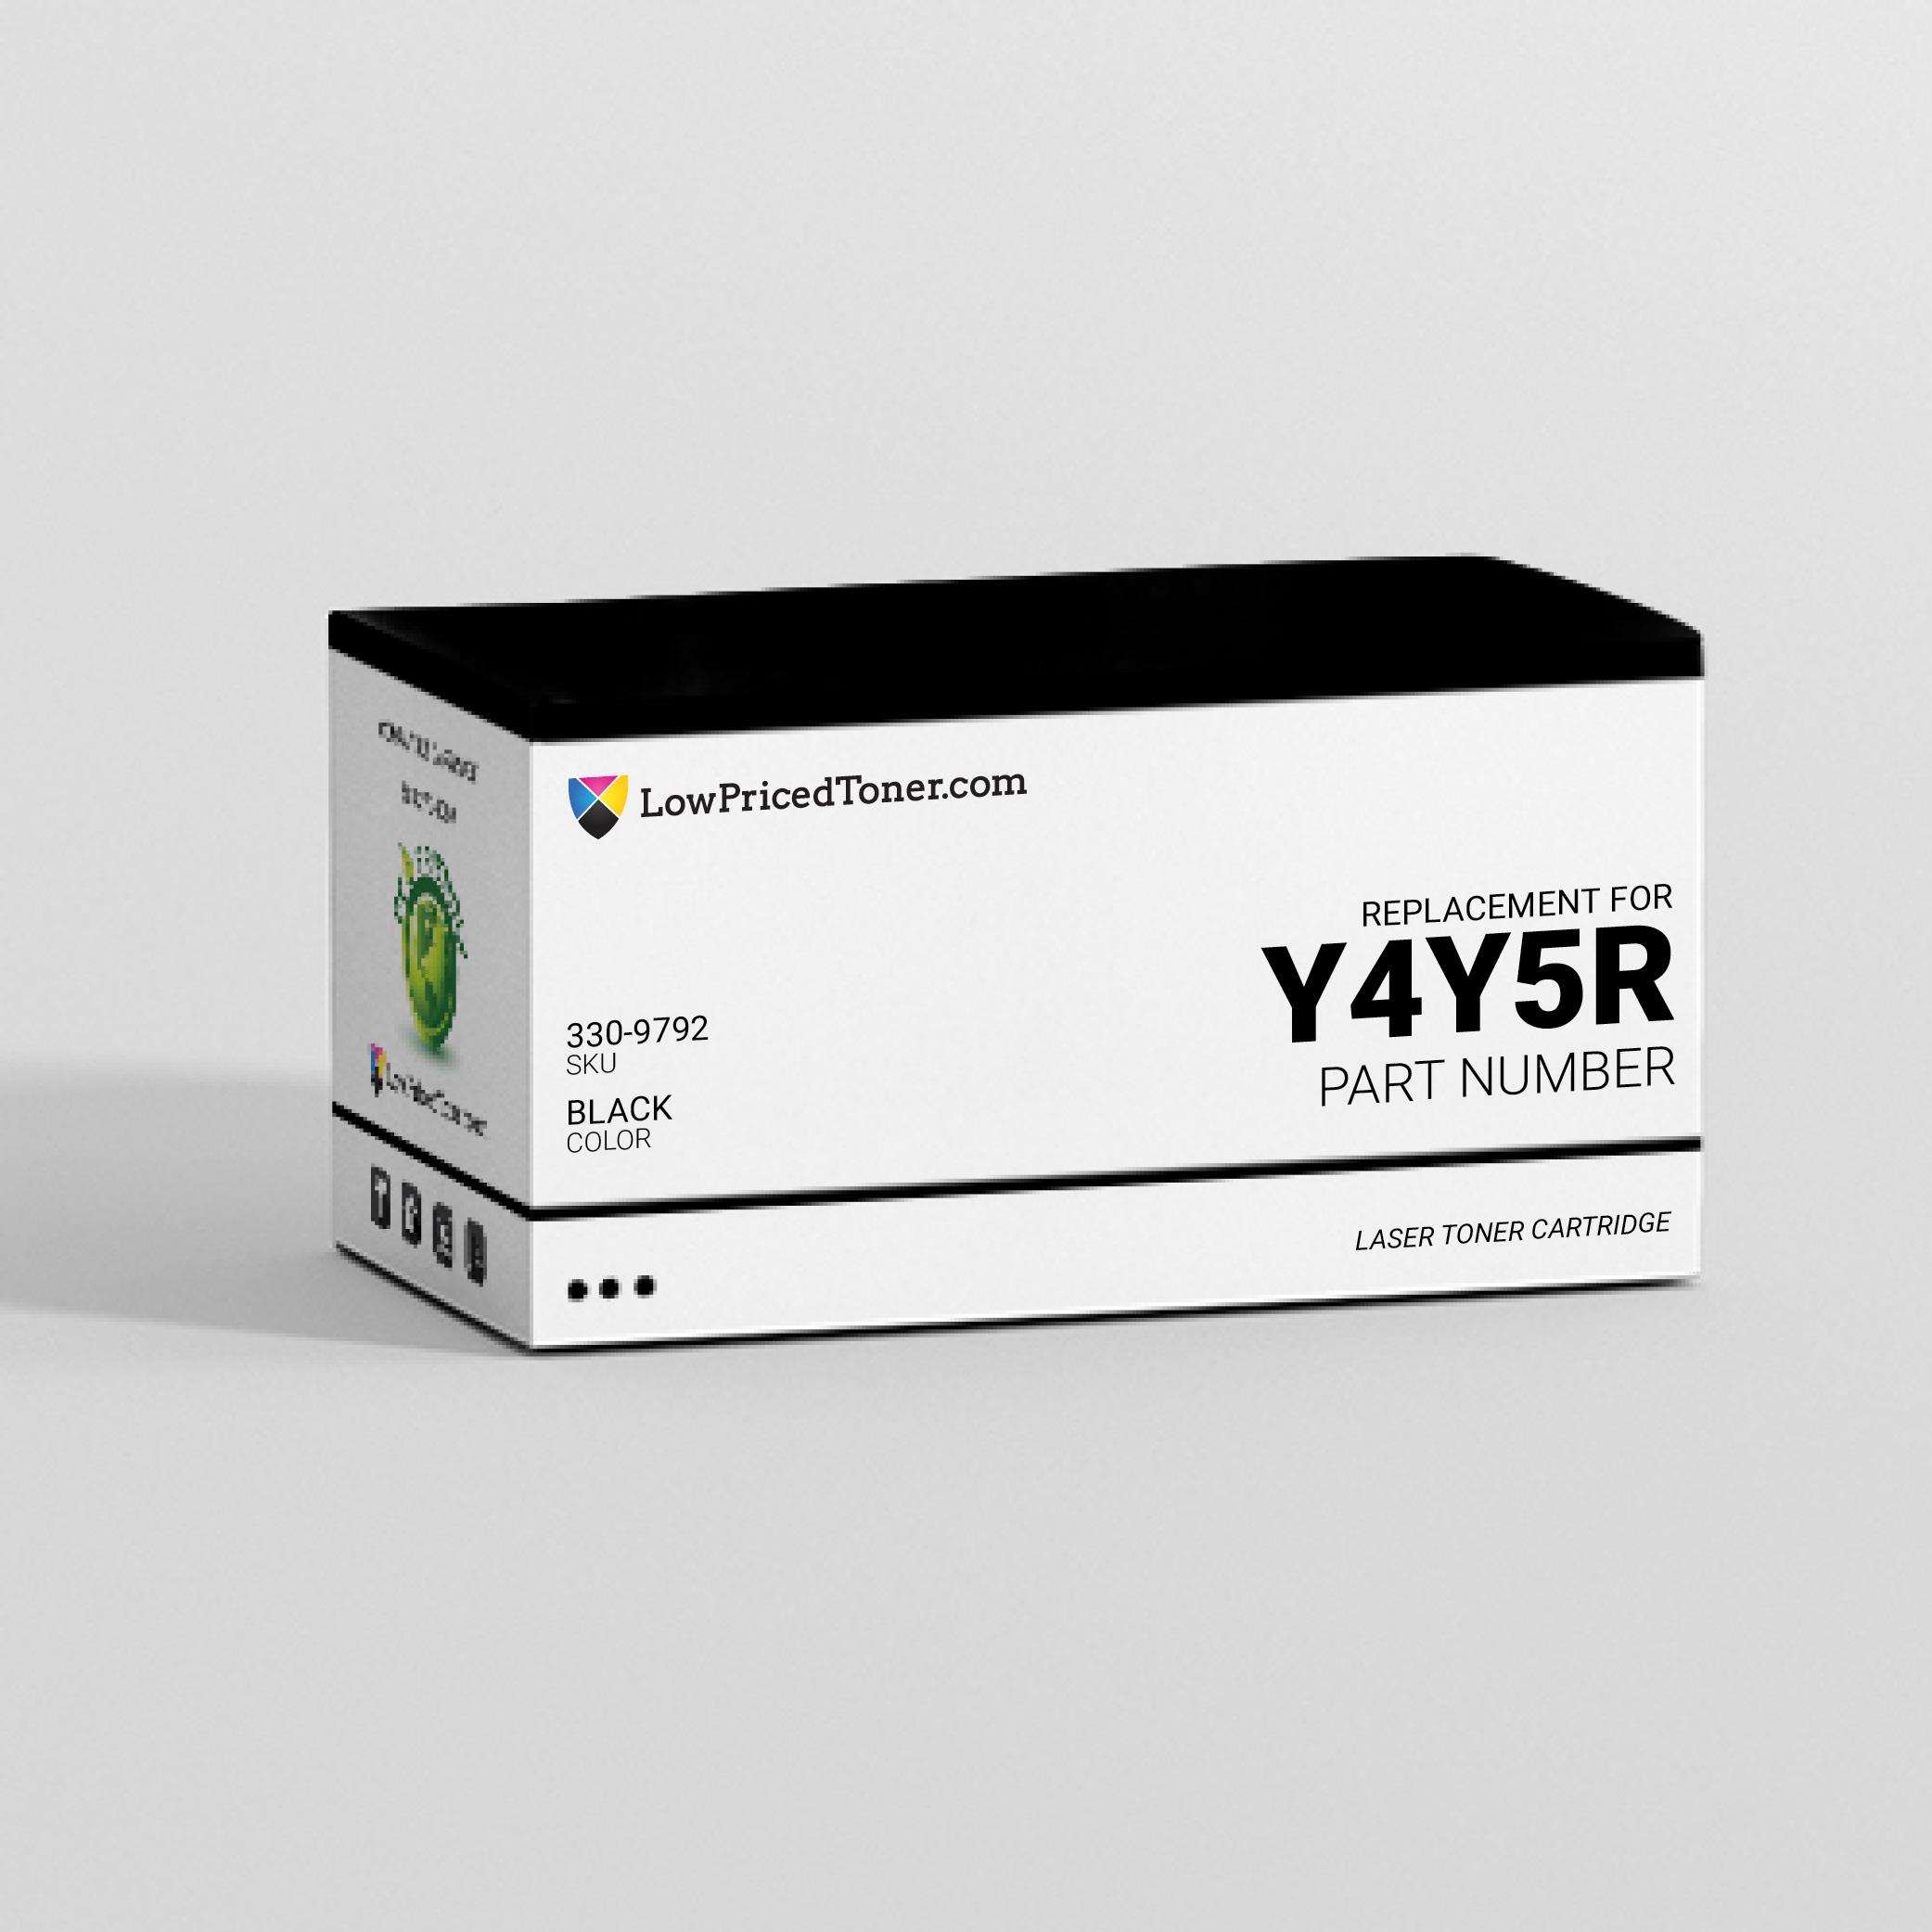 Dell 330-9792 Y4Y5R Remanufactured Black Laser Toner Cartridge